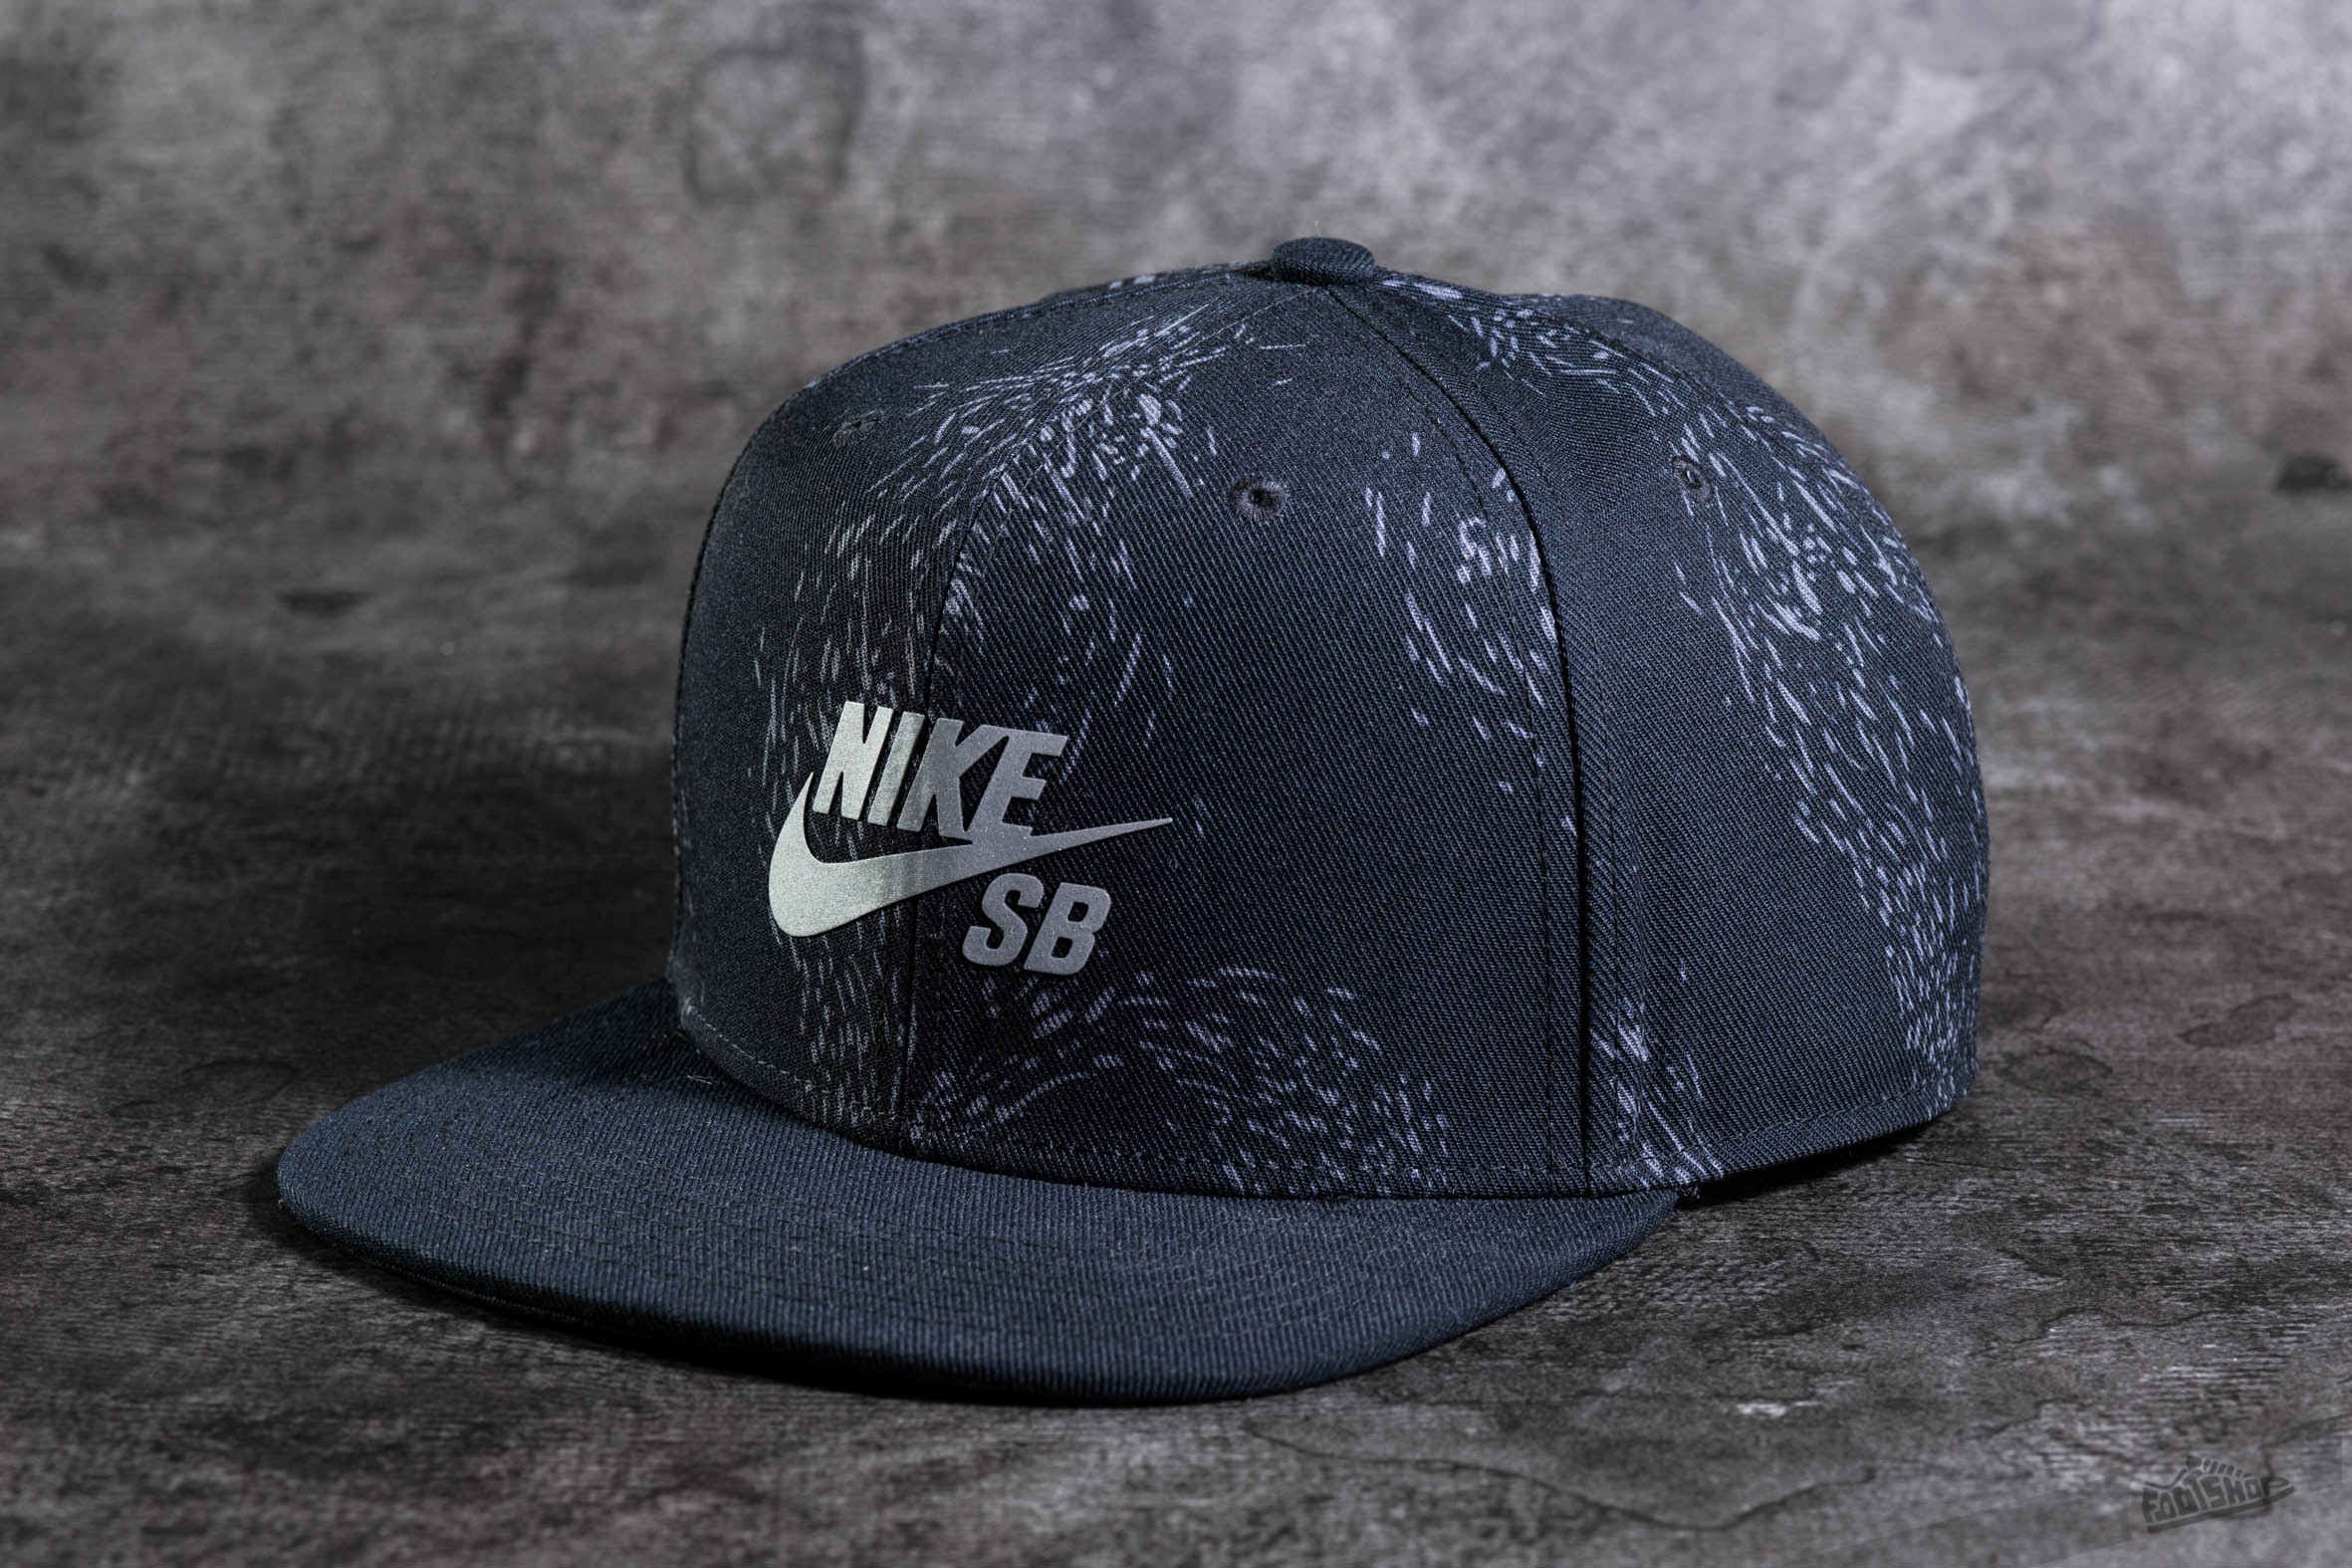 e56ffab9196 Nike SB Swarm Snapback Black